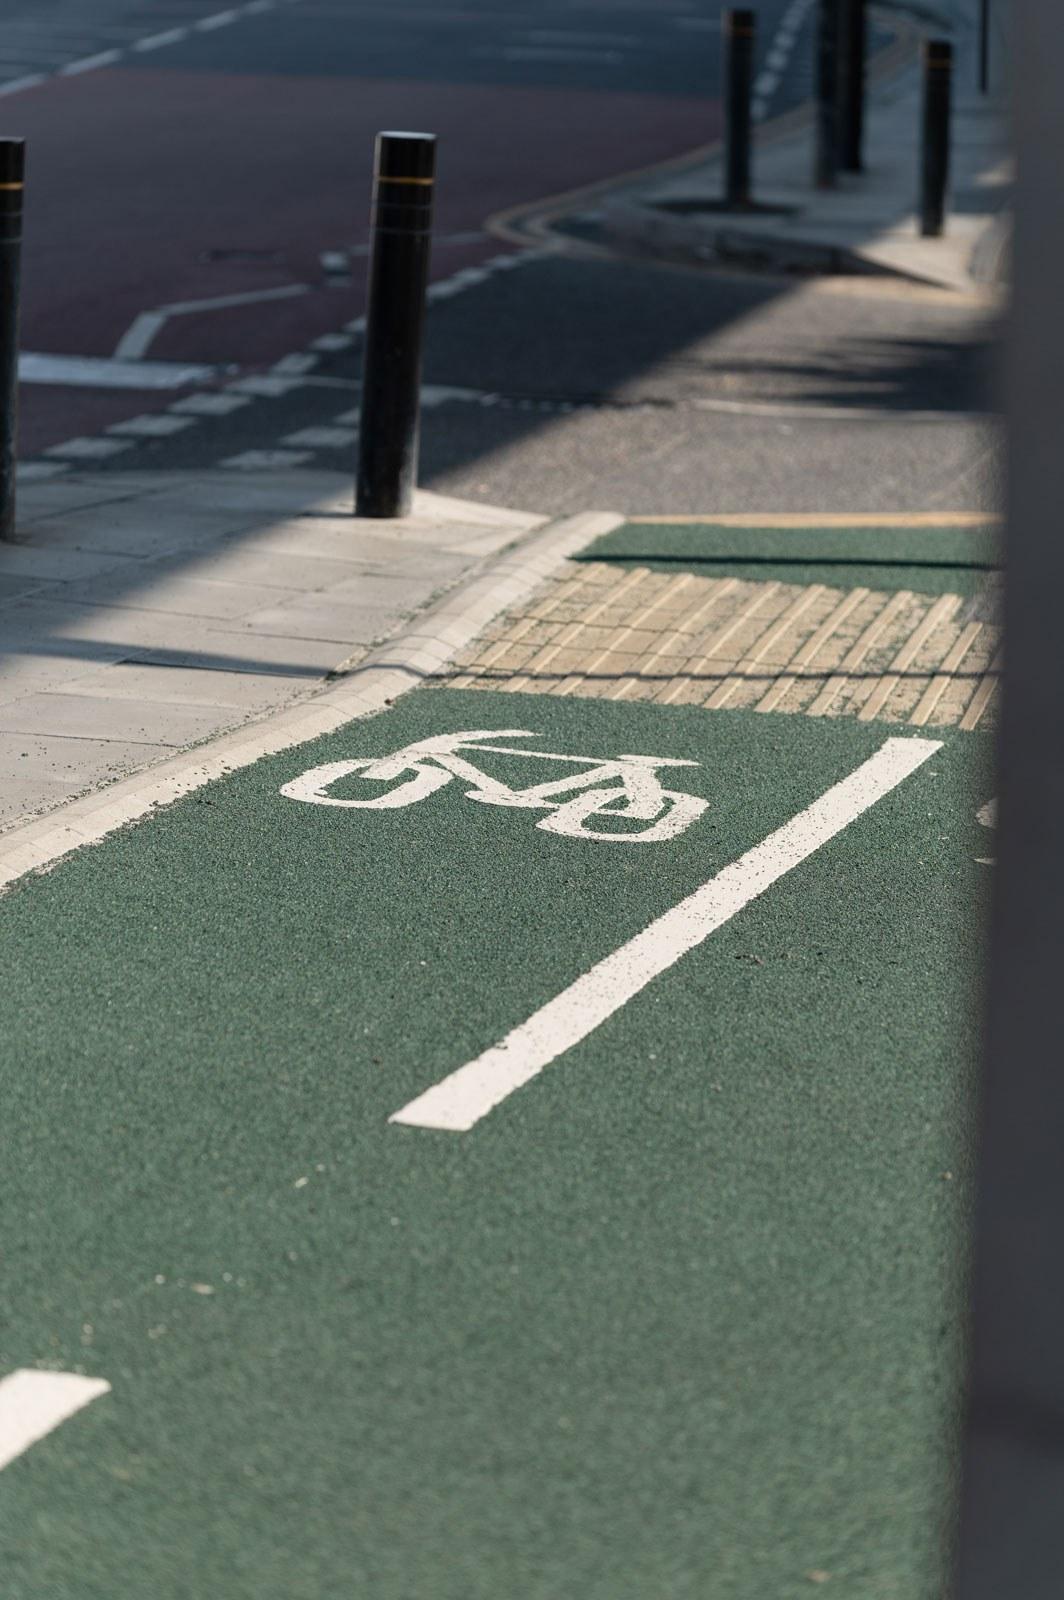 A green bike lane with a painted bike symbol